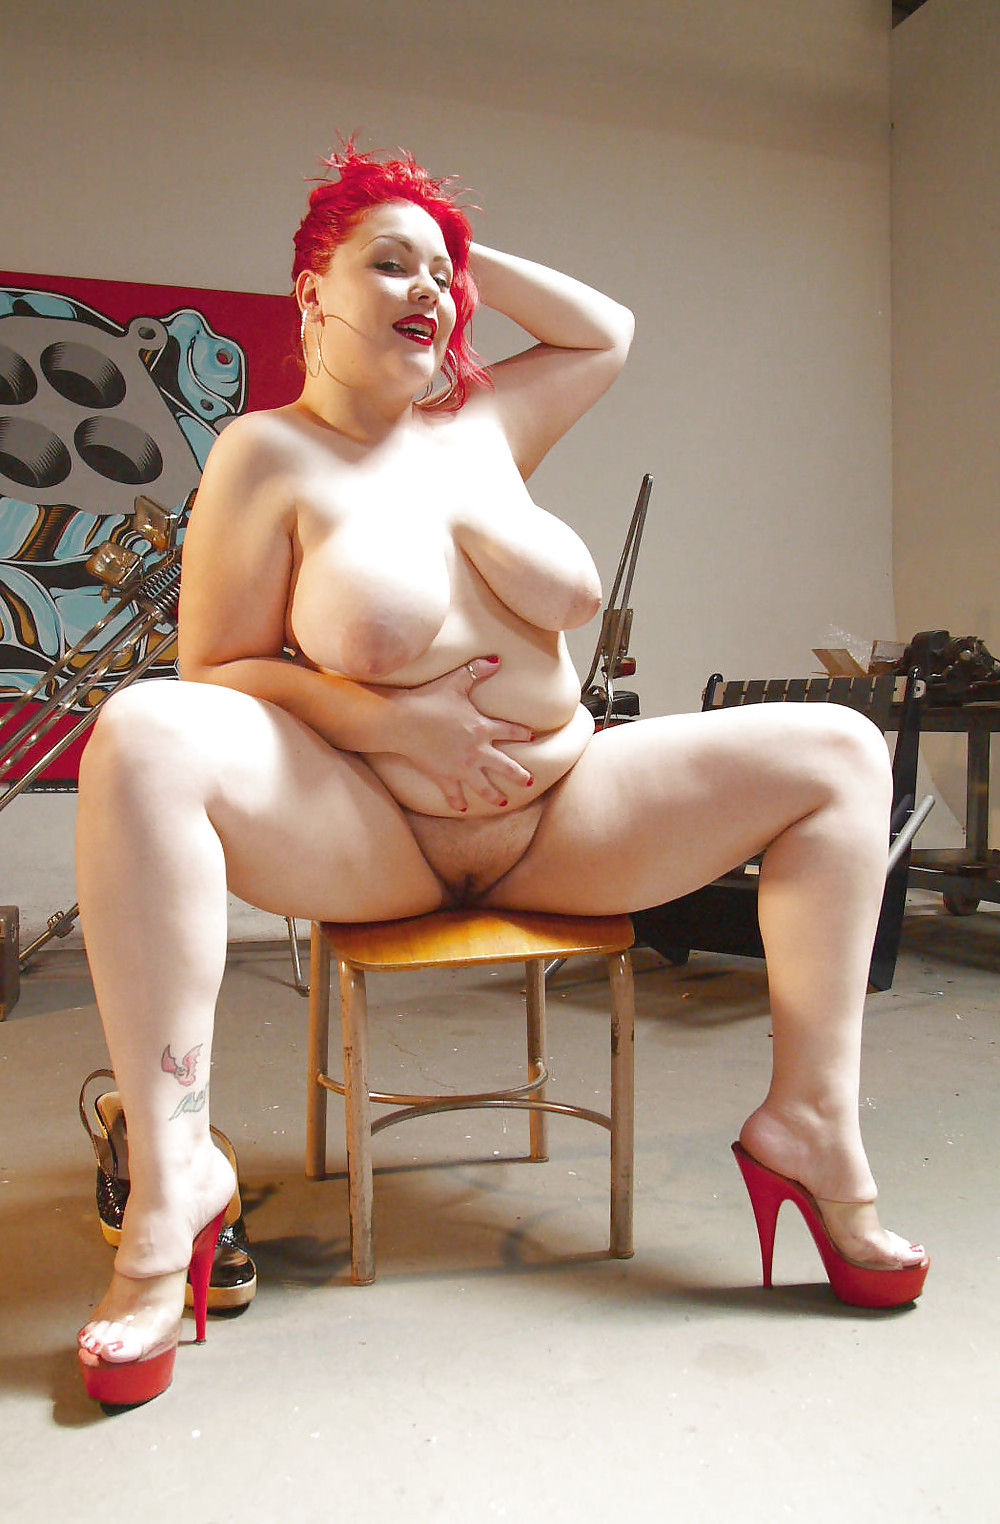 chubby-high-heels-nude